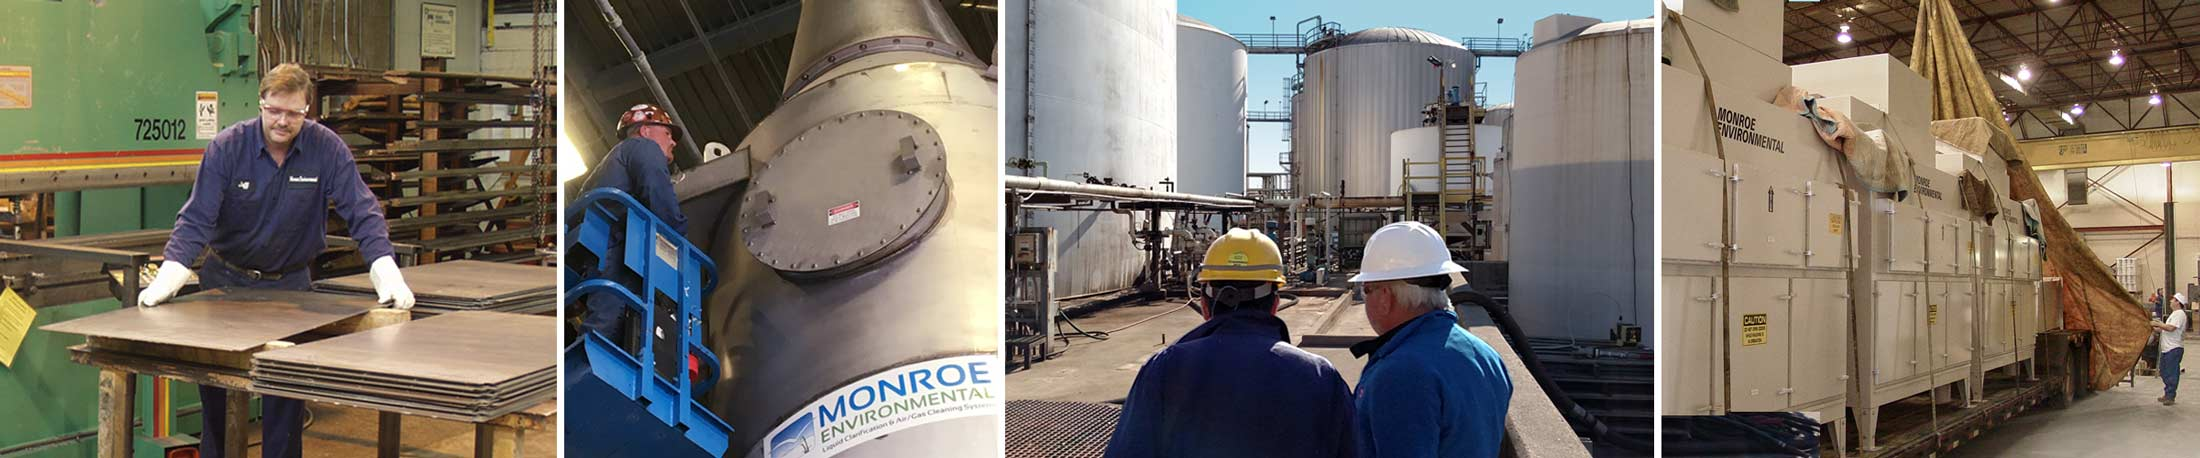 Employment opportunities at Monroe Environmental